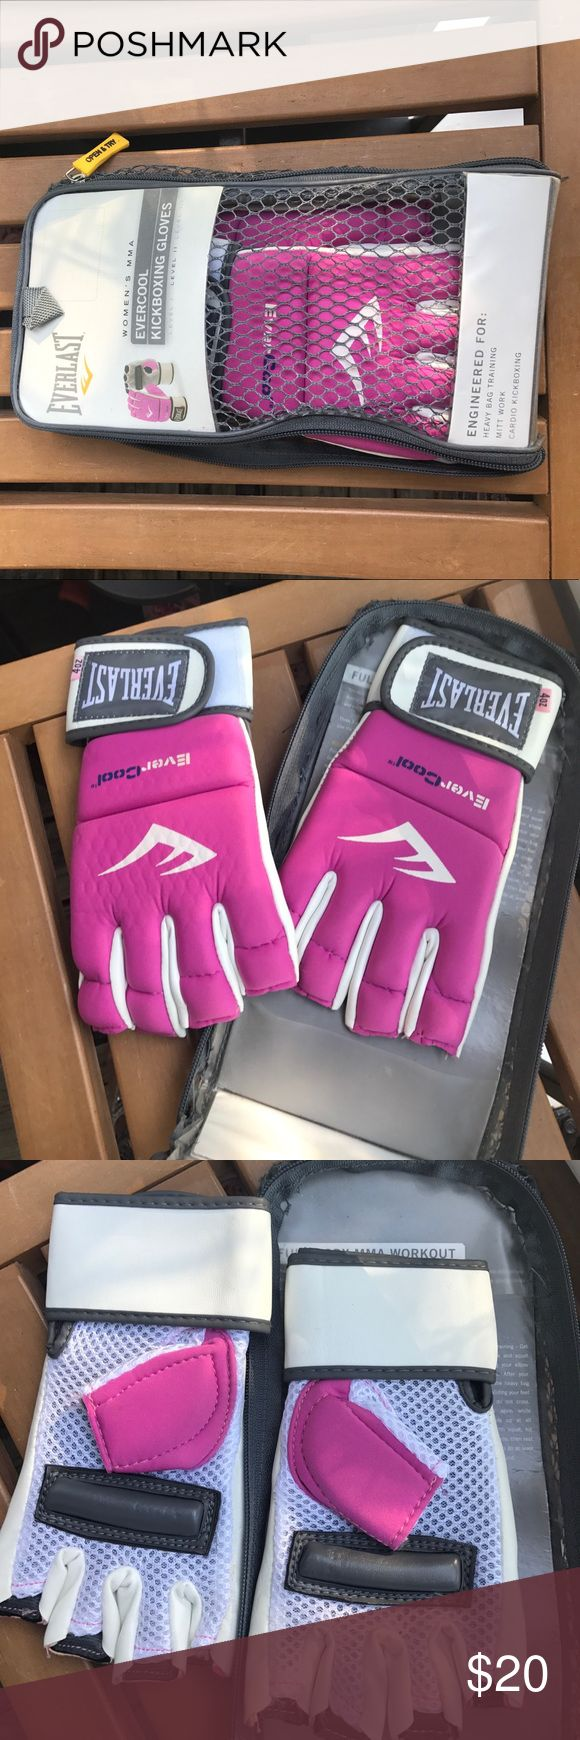 Everlast Women's MMA kickboxing gloves Everlast level II Advanced Technology & Materials pink and white gloves for kickboxing- like new Everlast Other